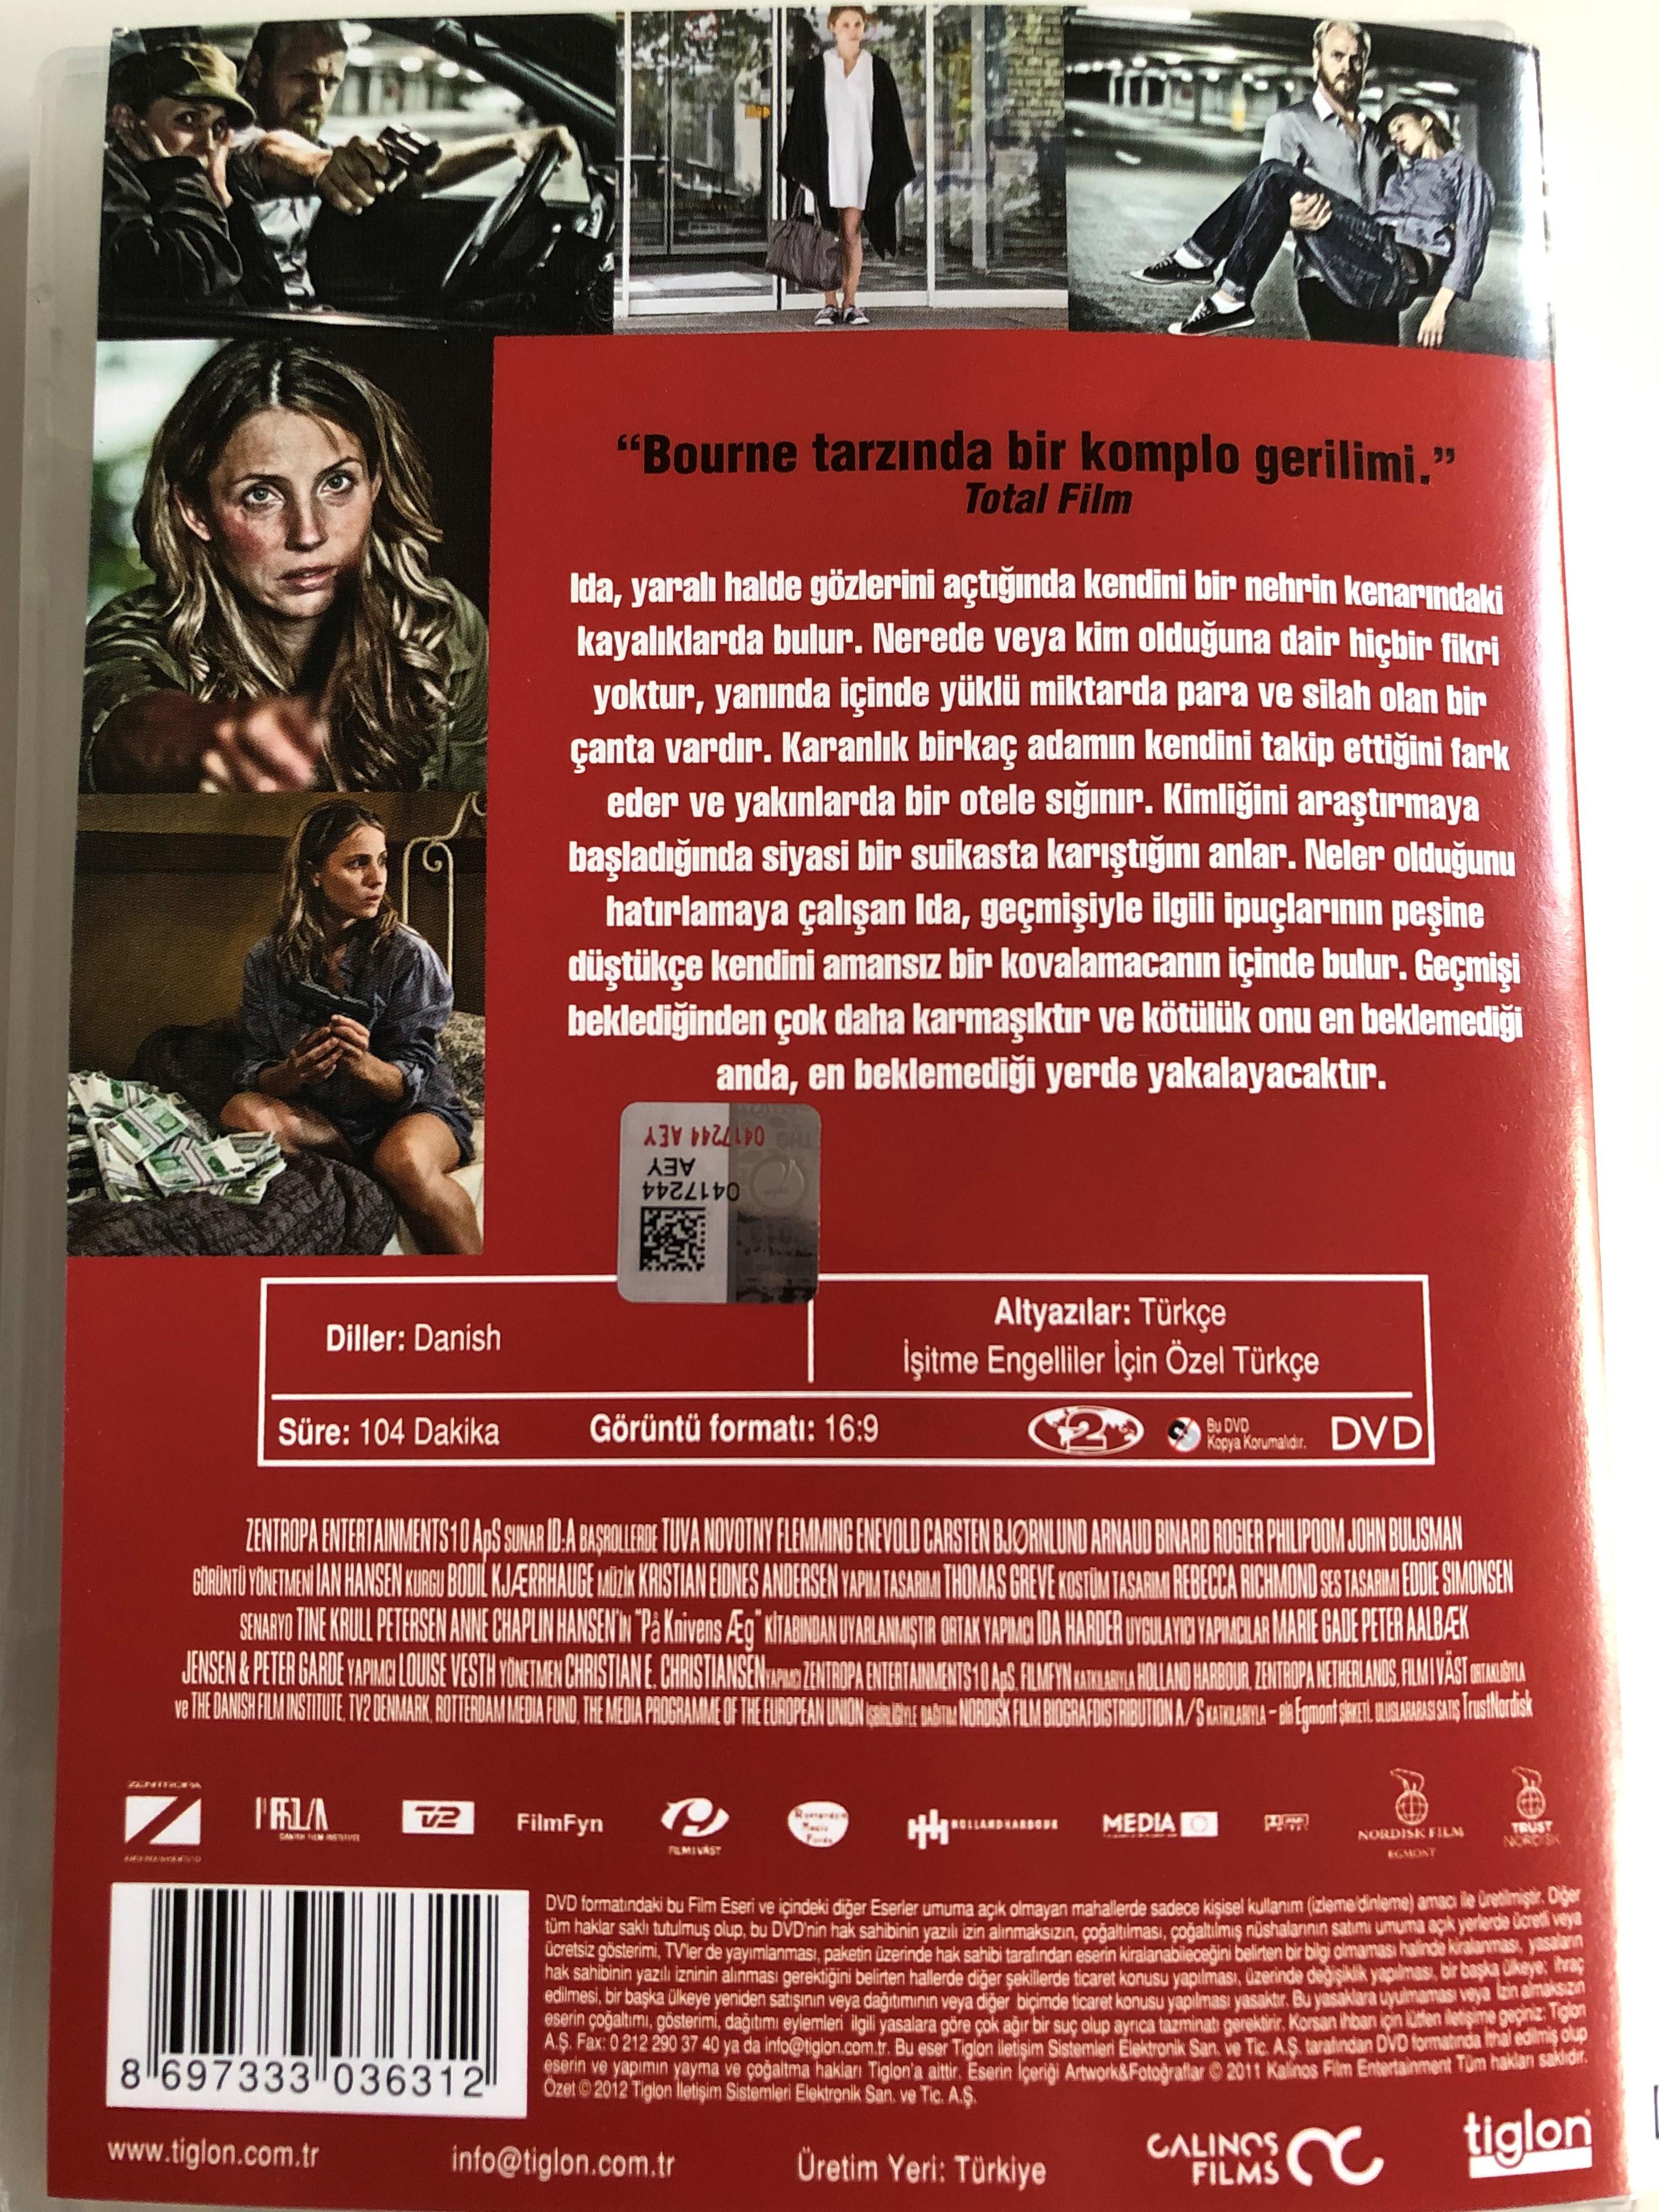 ida-dvd-2011-kayip-kimlik-directed-by-christian-e.-christiansen-2-.jpg